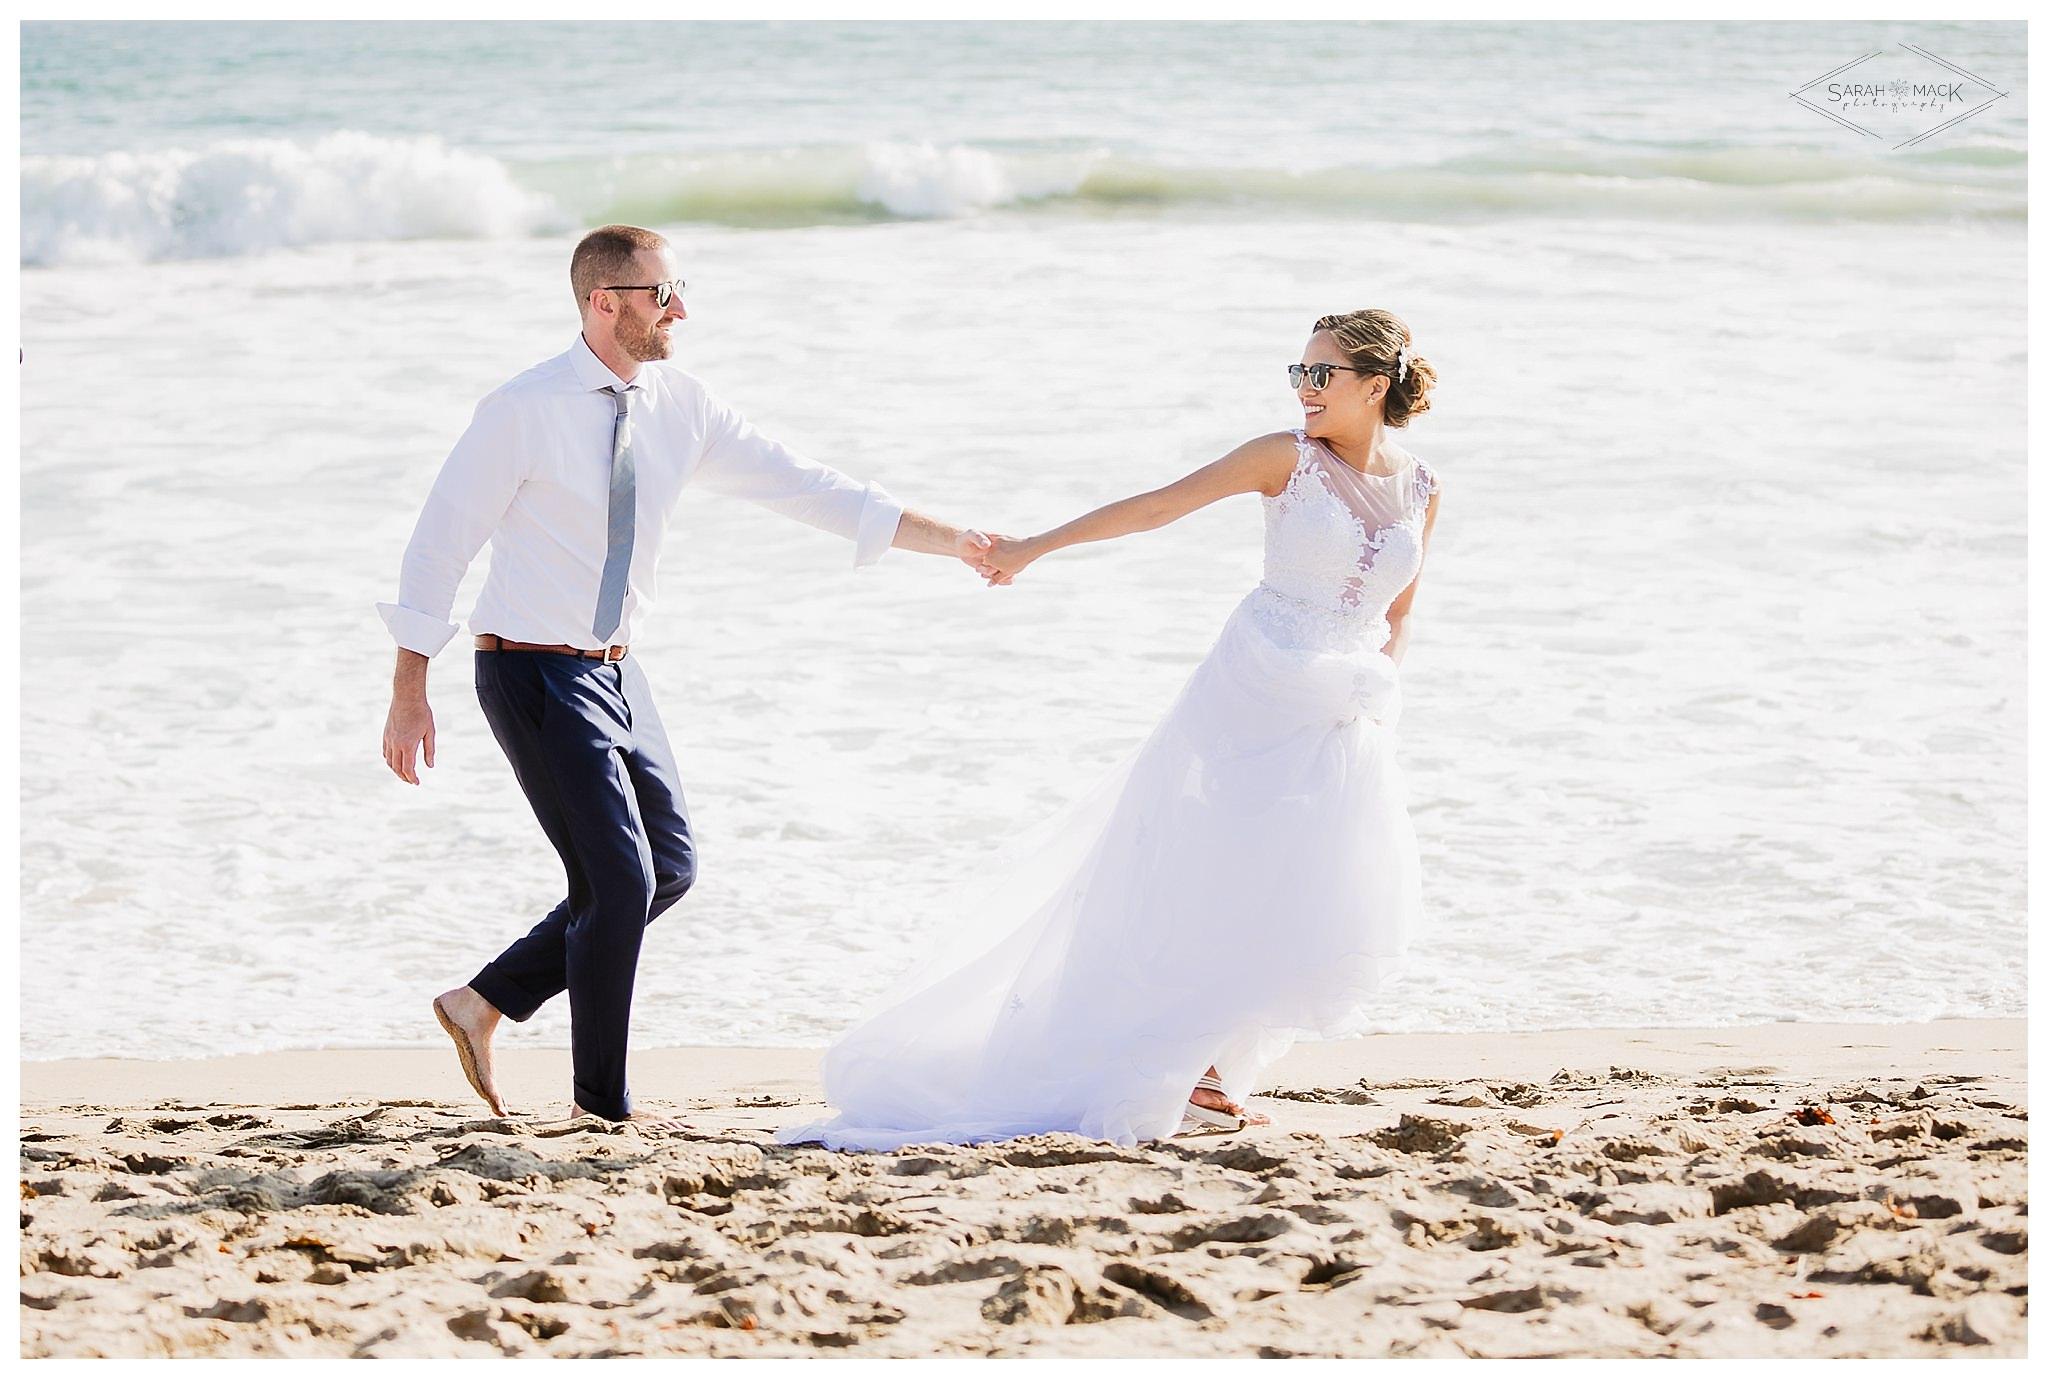 MR-Sea-Cliffe-Country-Club-Huntington-Beach-Wedding-0114.jpg